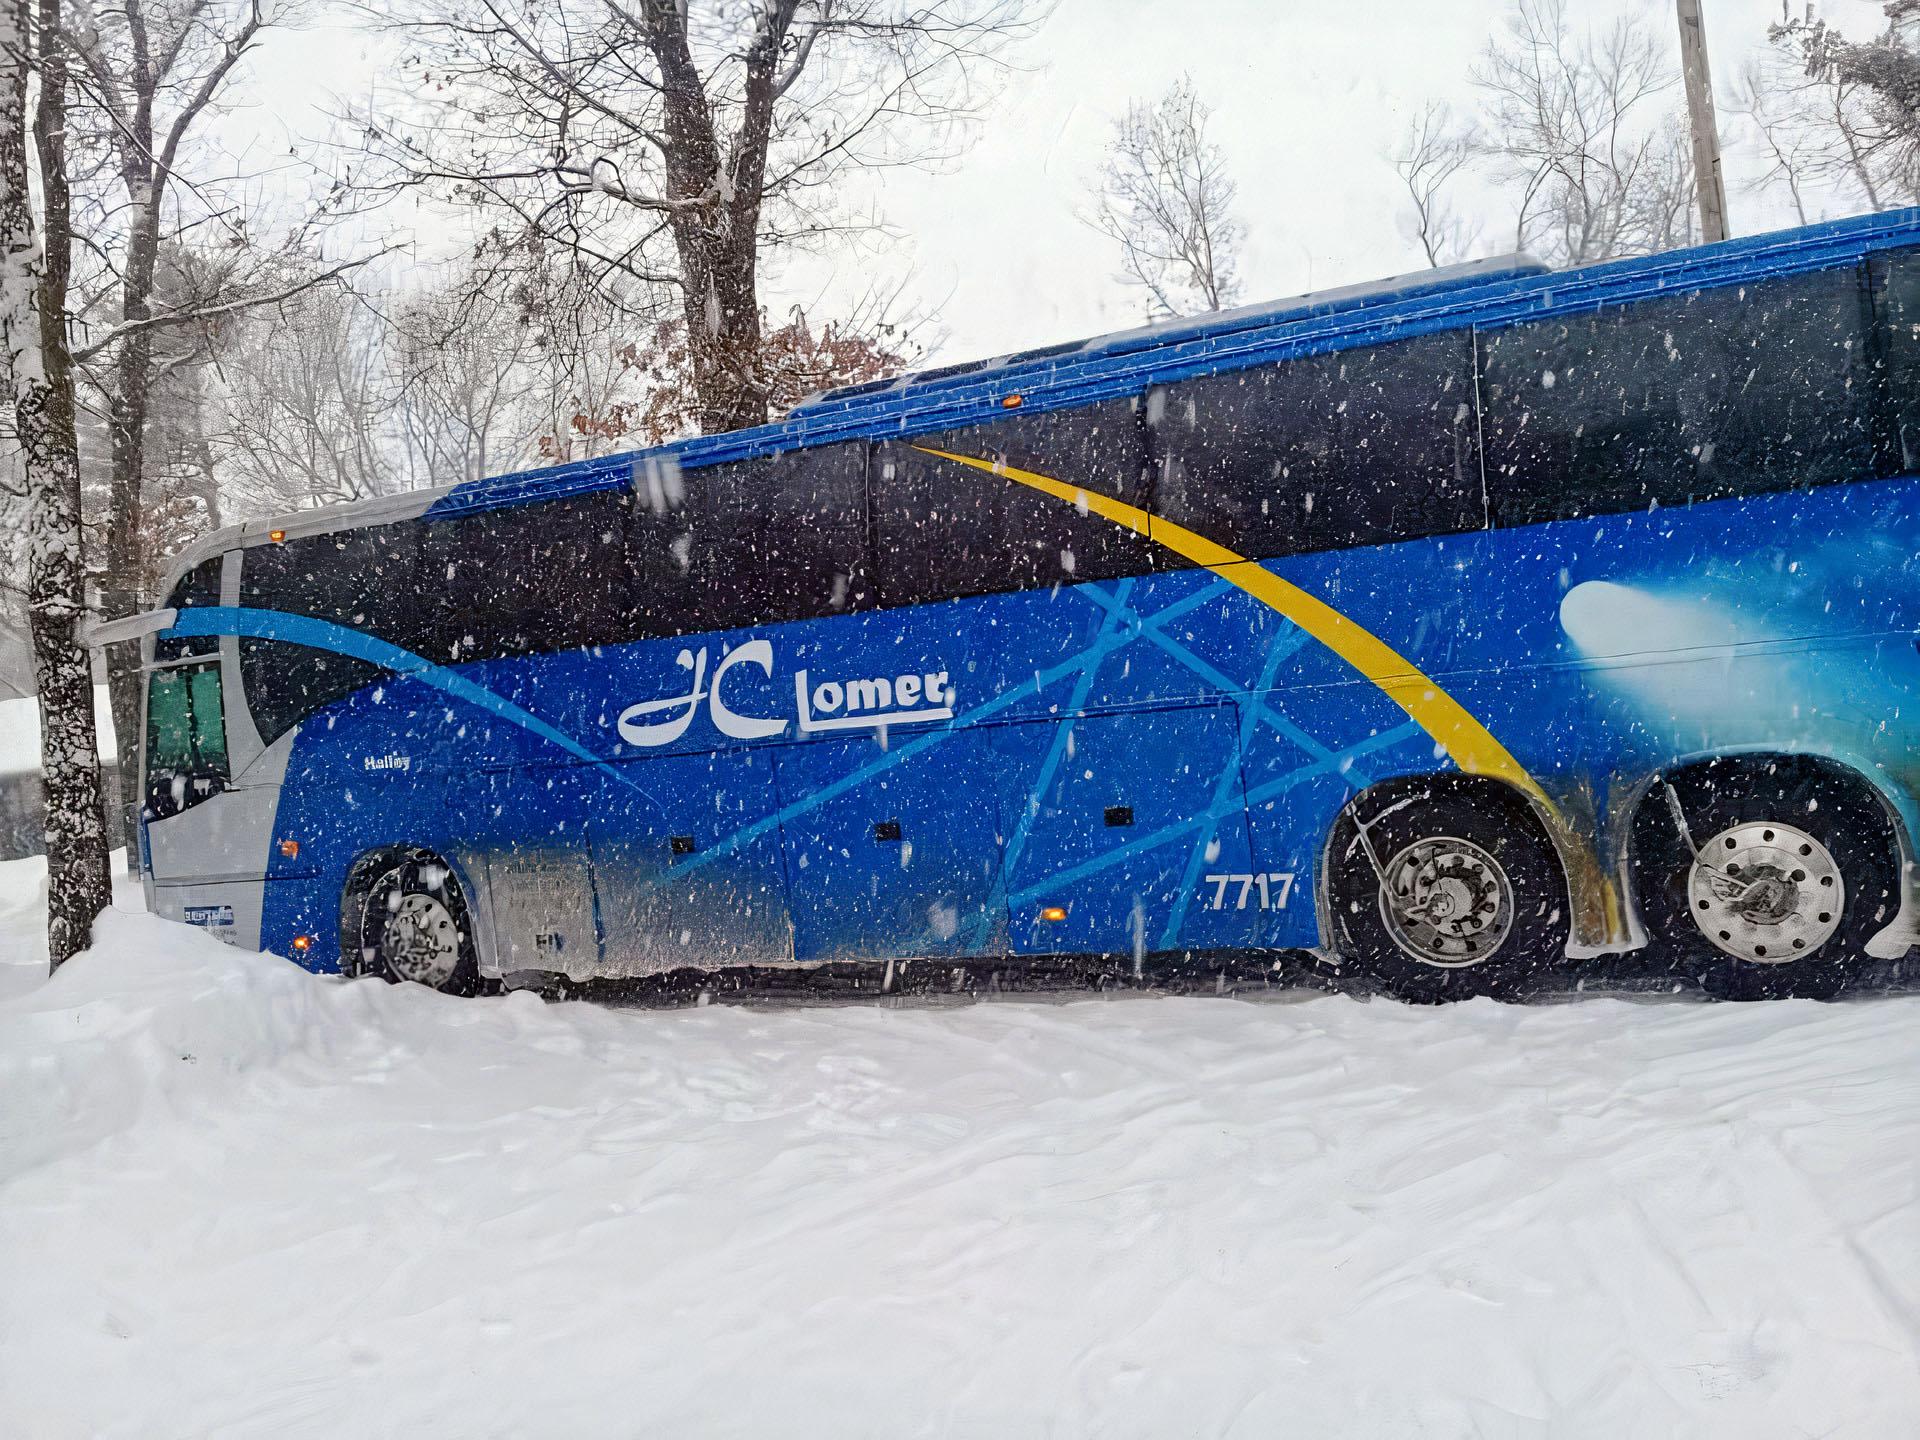 Volvo-9700-monobloco-atolado-neve-EUA.jpg